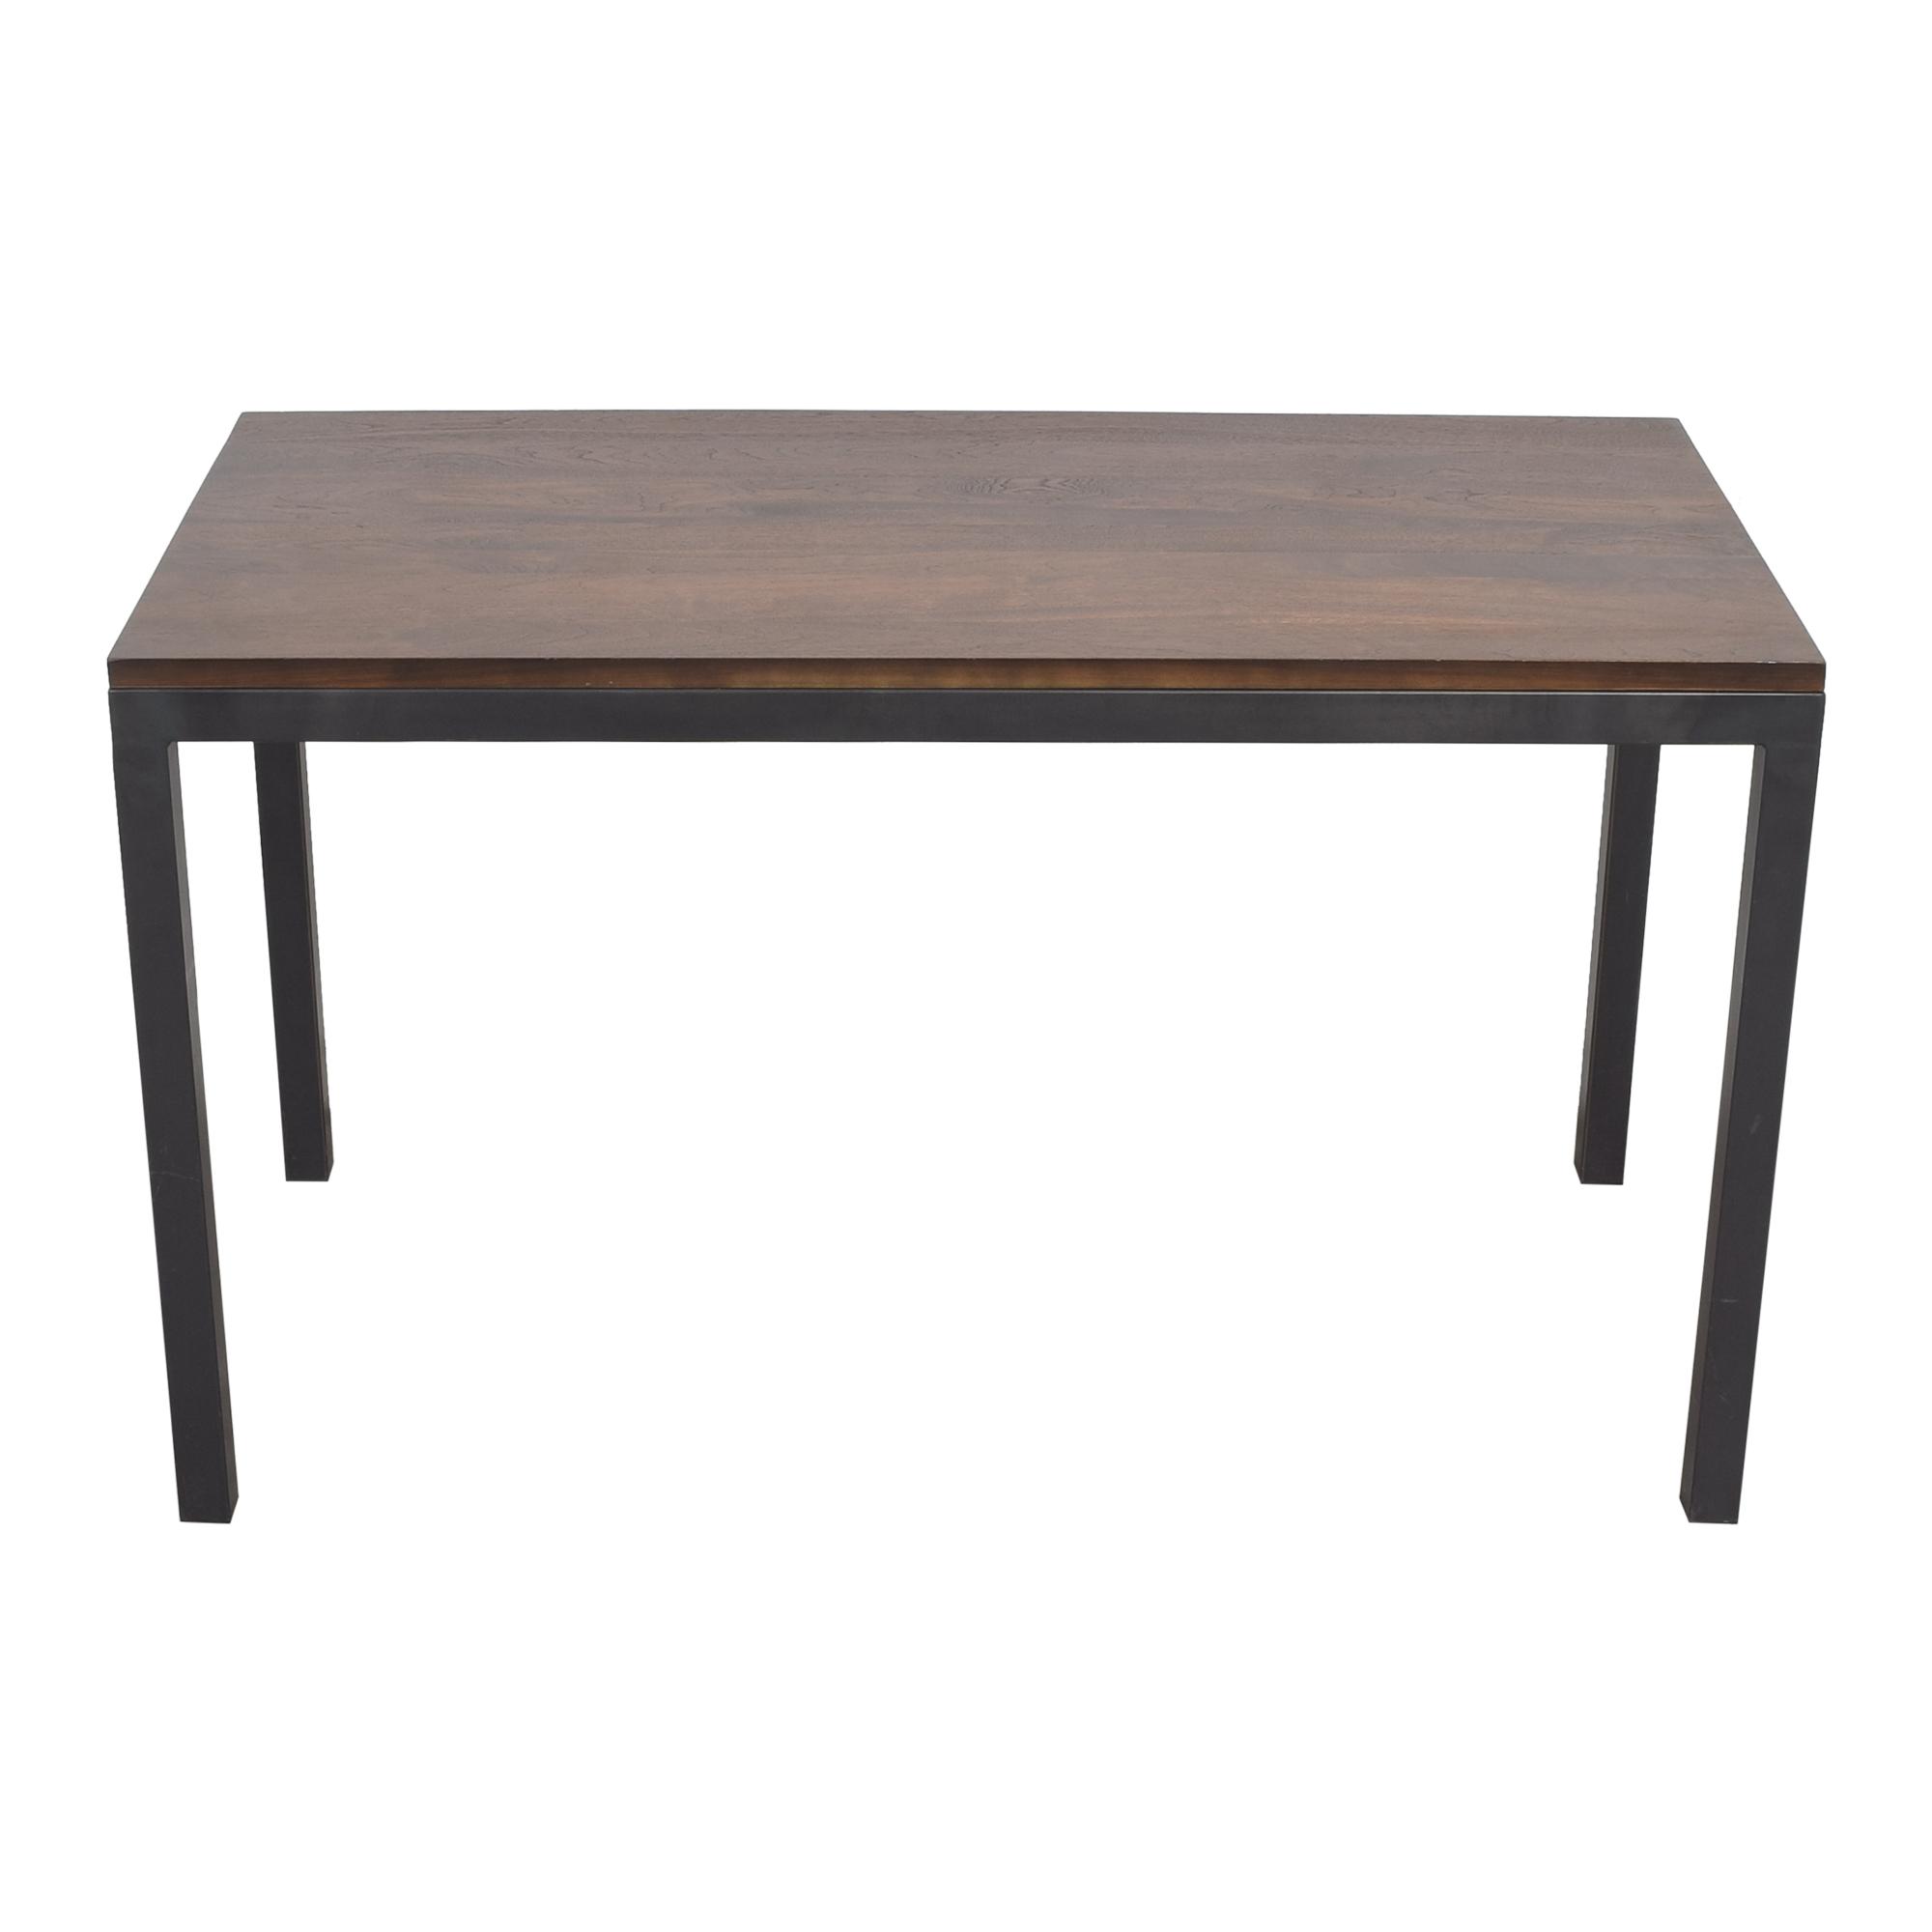 Room & Board Room & Board Parsons Counter Table ma